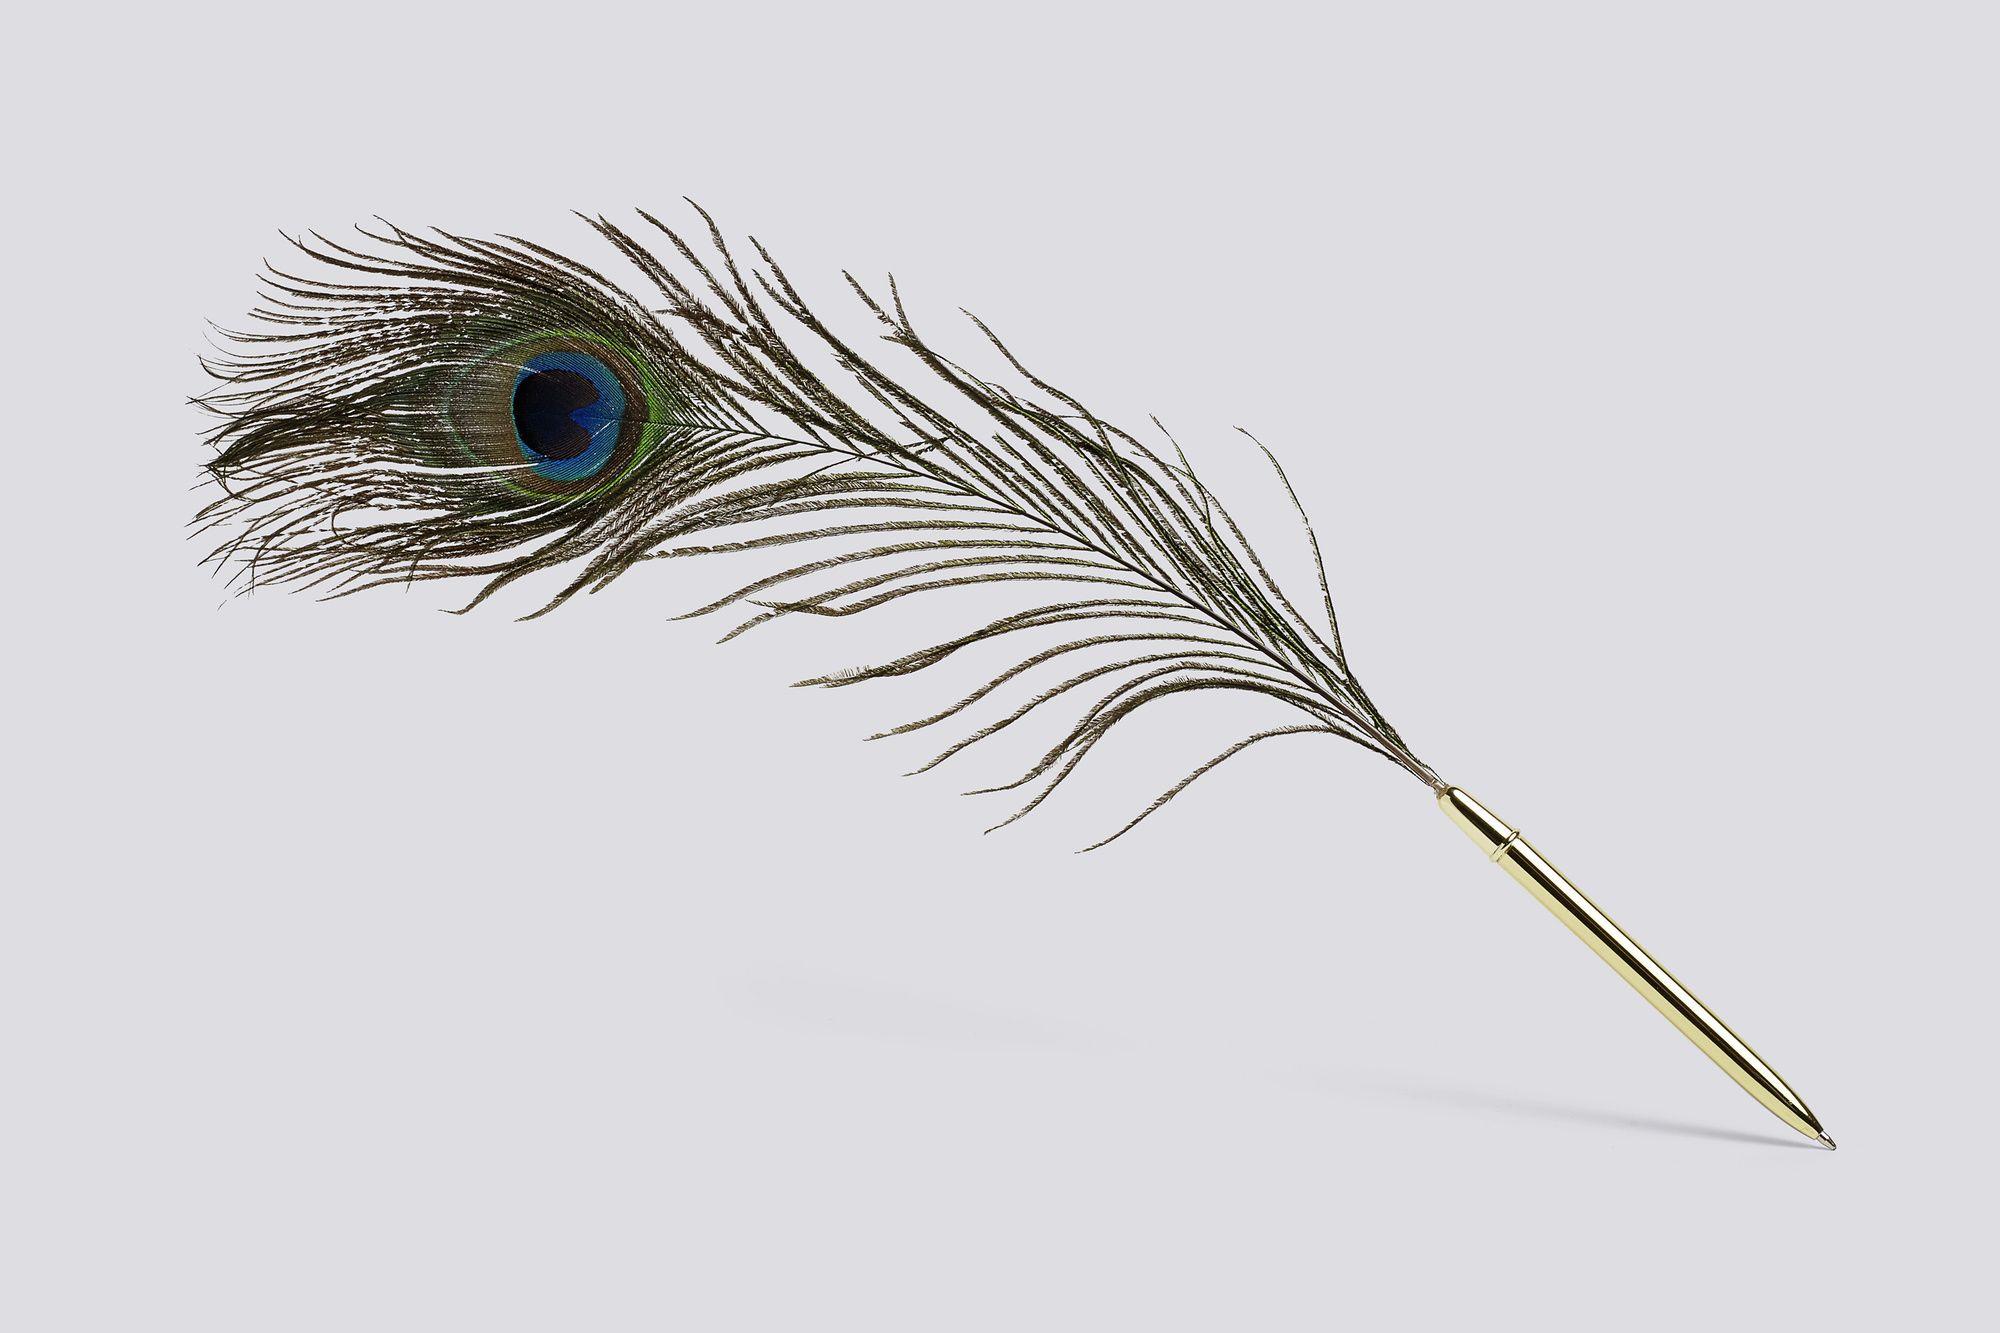 Peacock | http://www.hayonlinewinkel.com/nl/